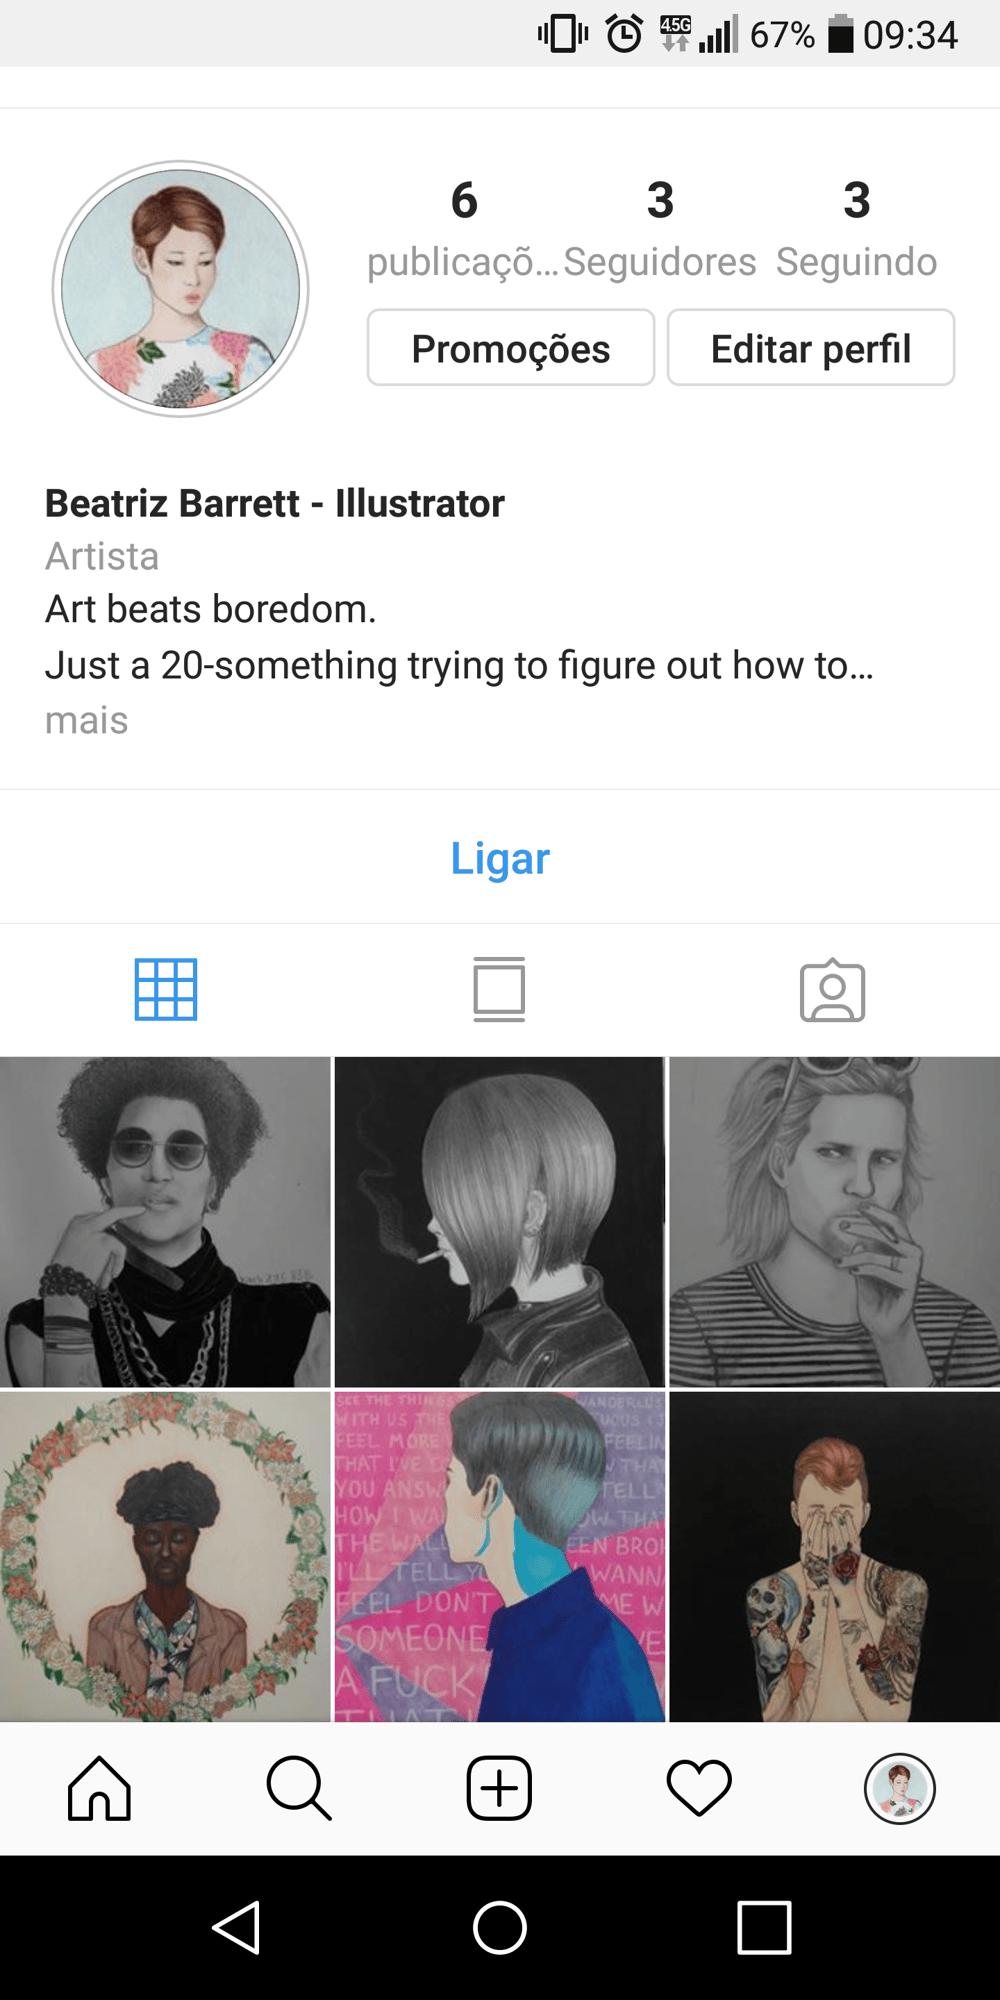 @biabarrett, new instagram art account! - image 1 - student project